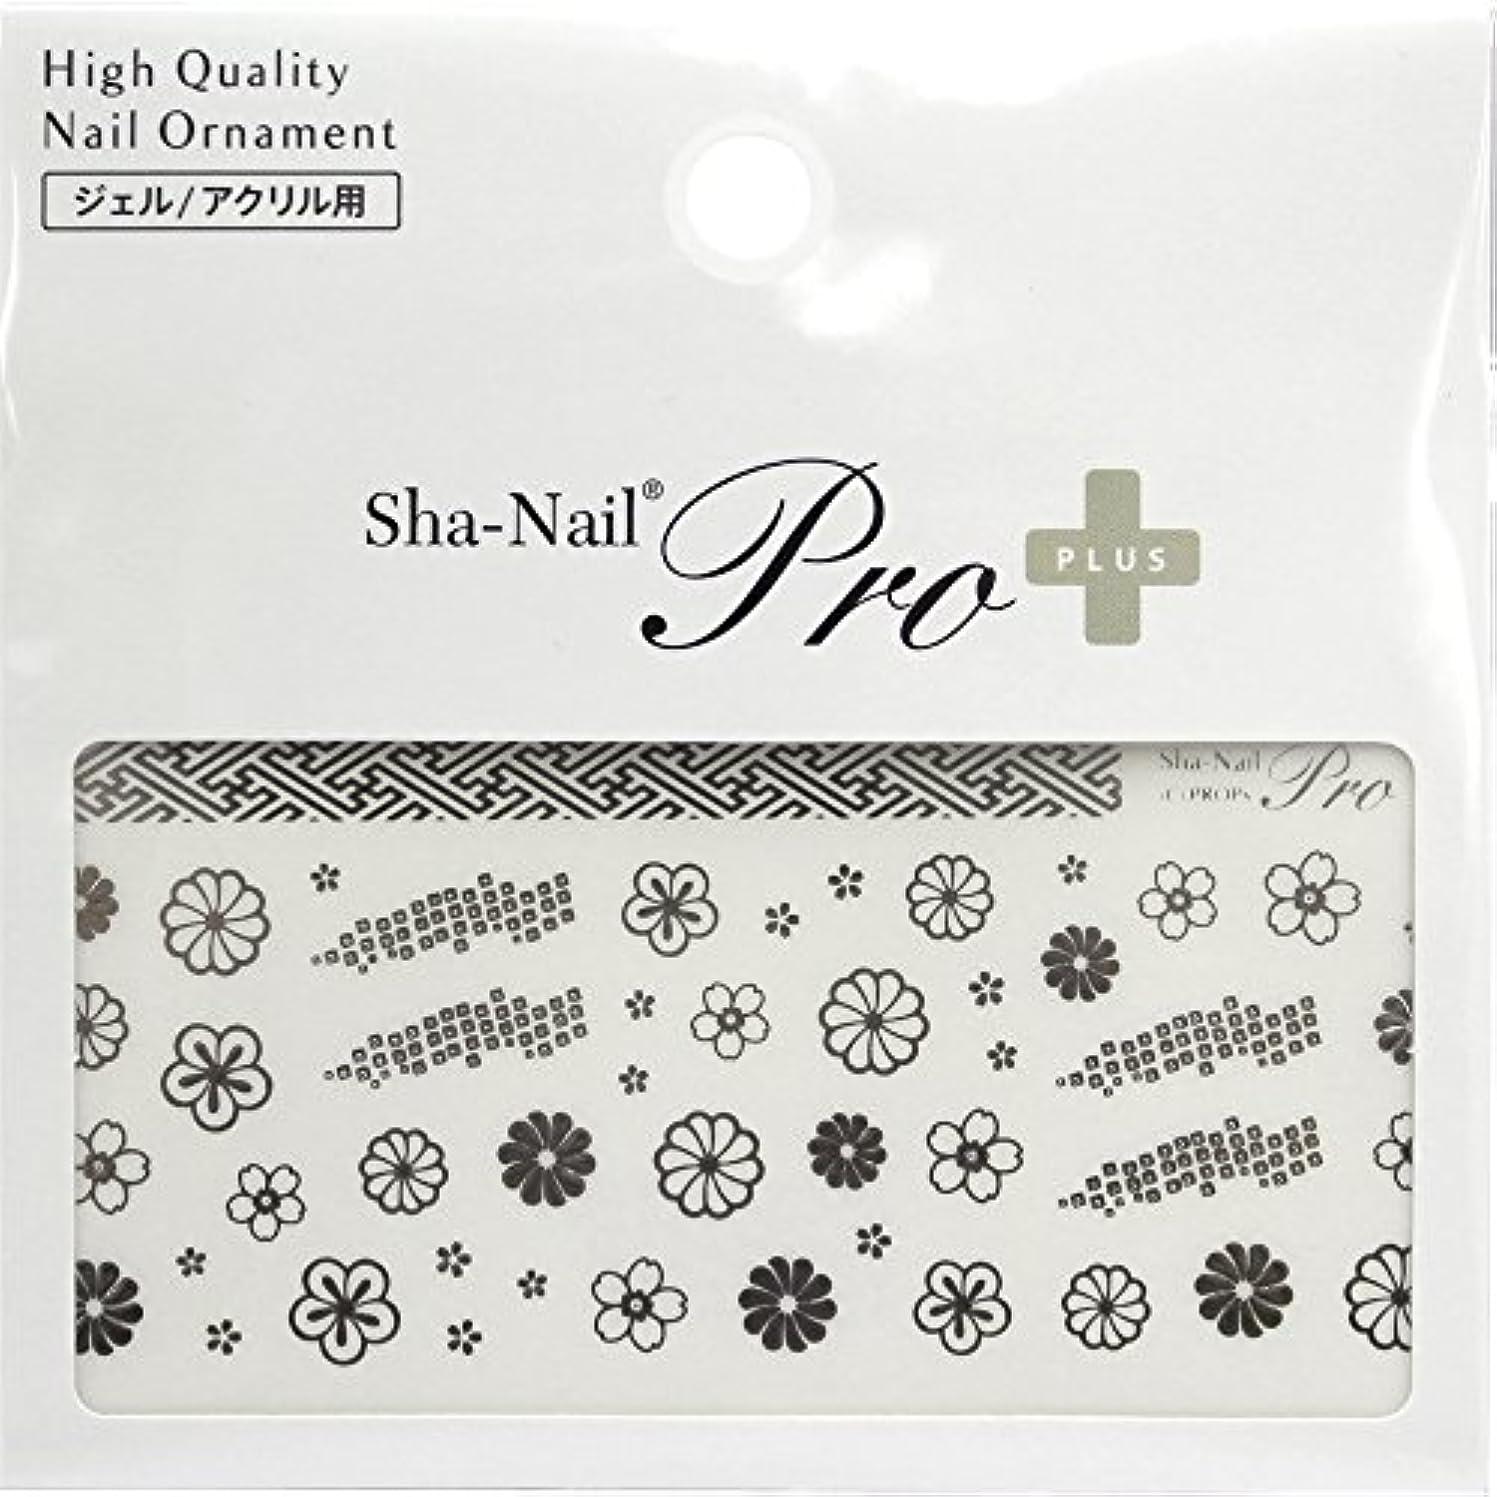 Sha-Nail PLUS ネイルシール 花綴り 銀 HTD-PS